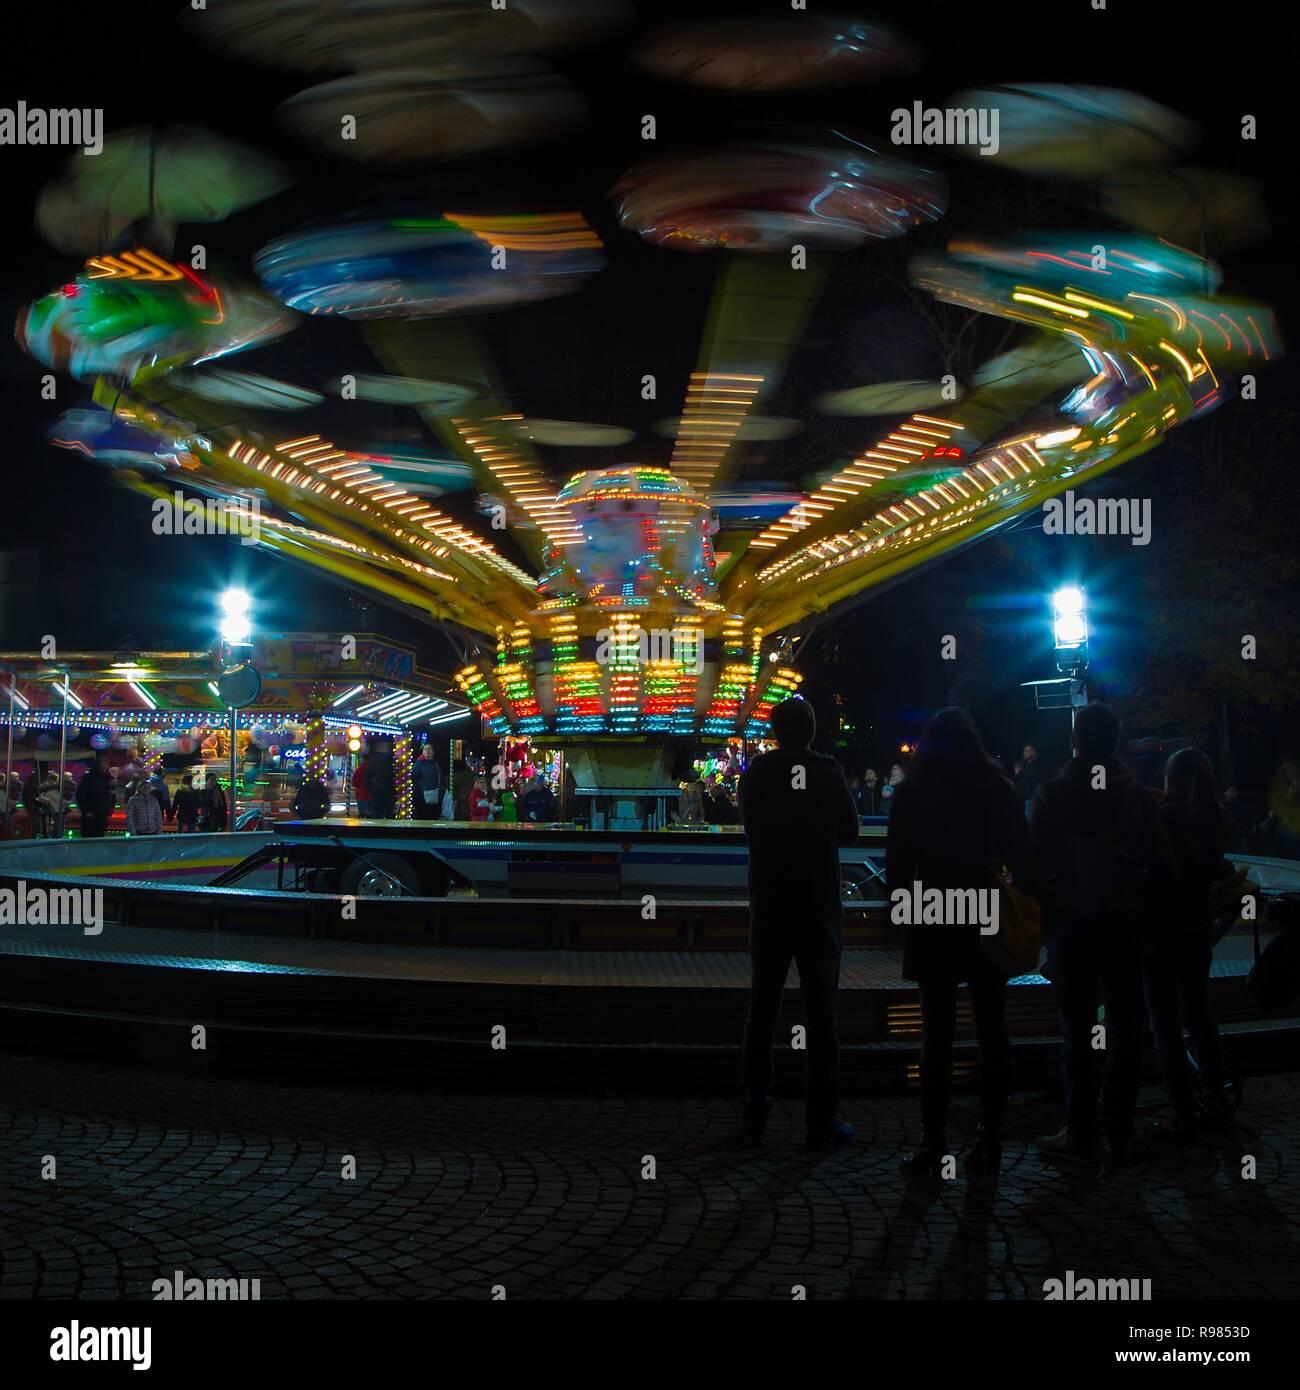 Gorizia, Italy - December 02, 2018: Annual traditional Christmas fair in center of Gorizia city, Italy. Ferris wheel on the background. - Stock Image